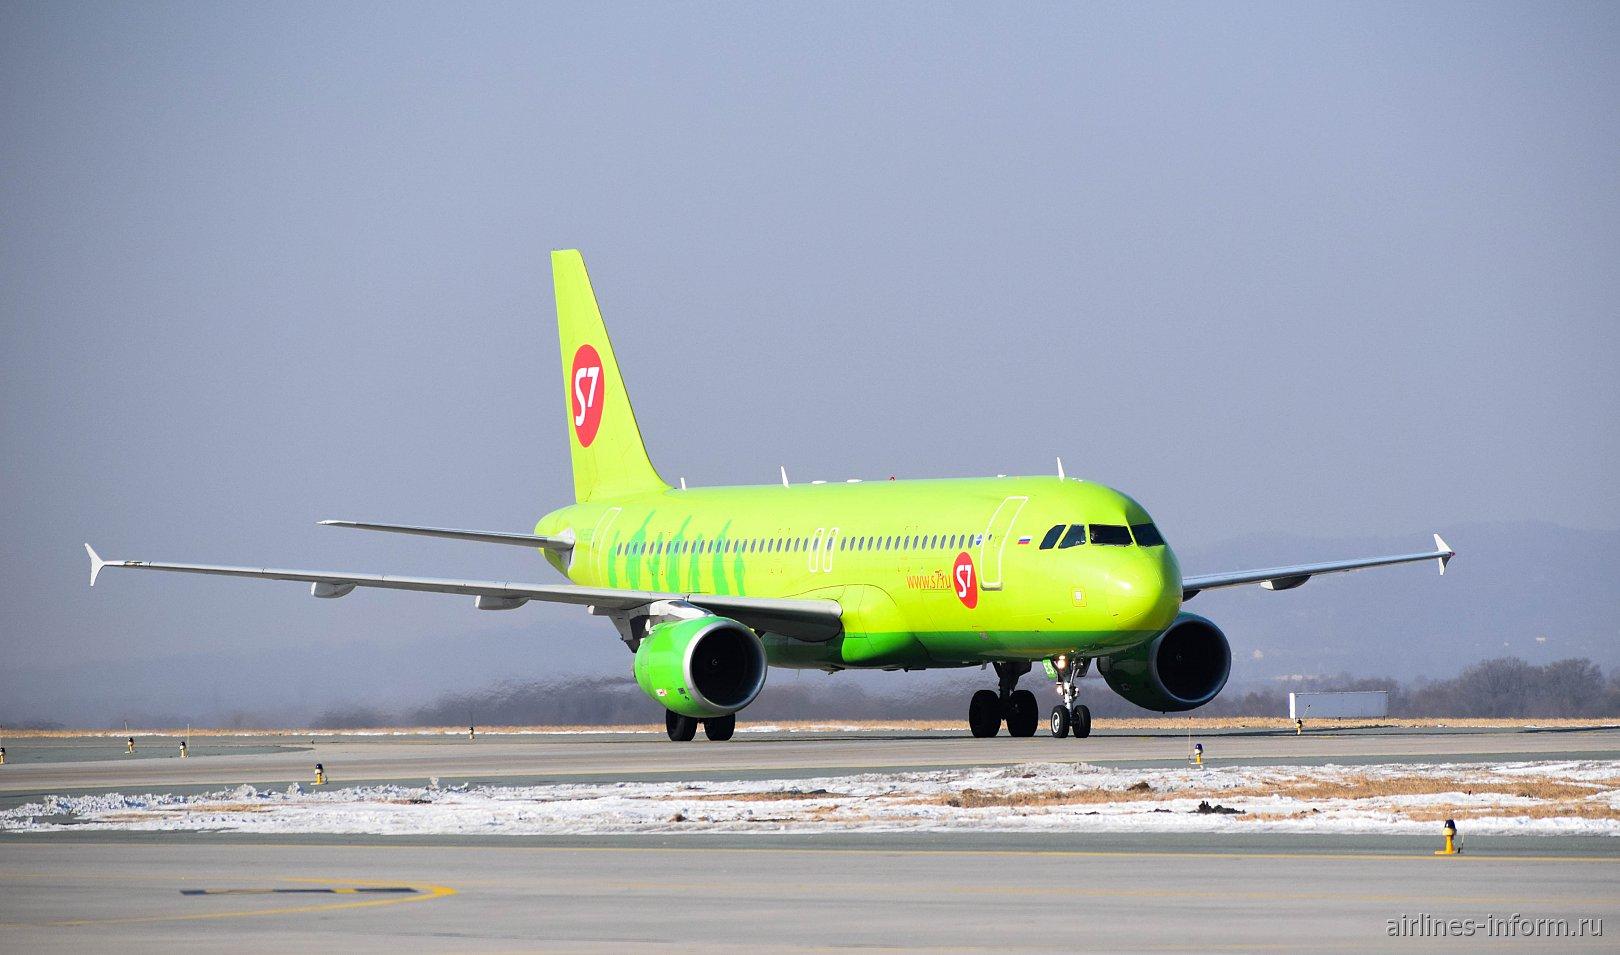 Самолет Airbus A320 VQ-BES авиакомпании S7 Airlines